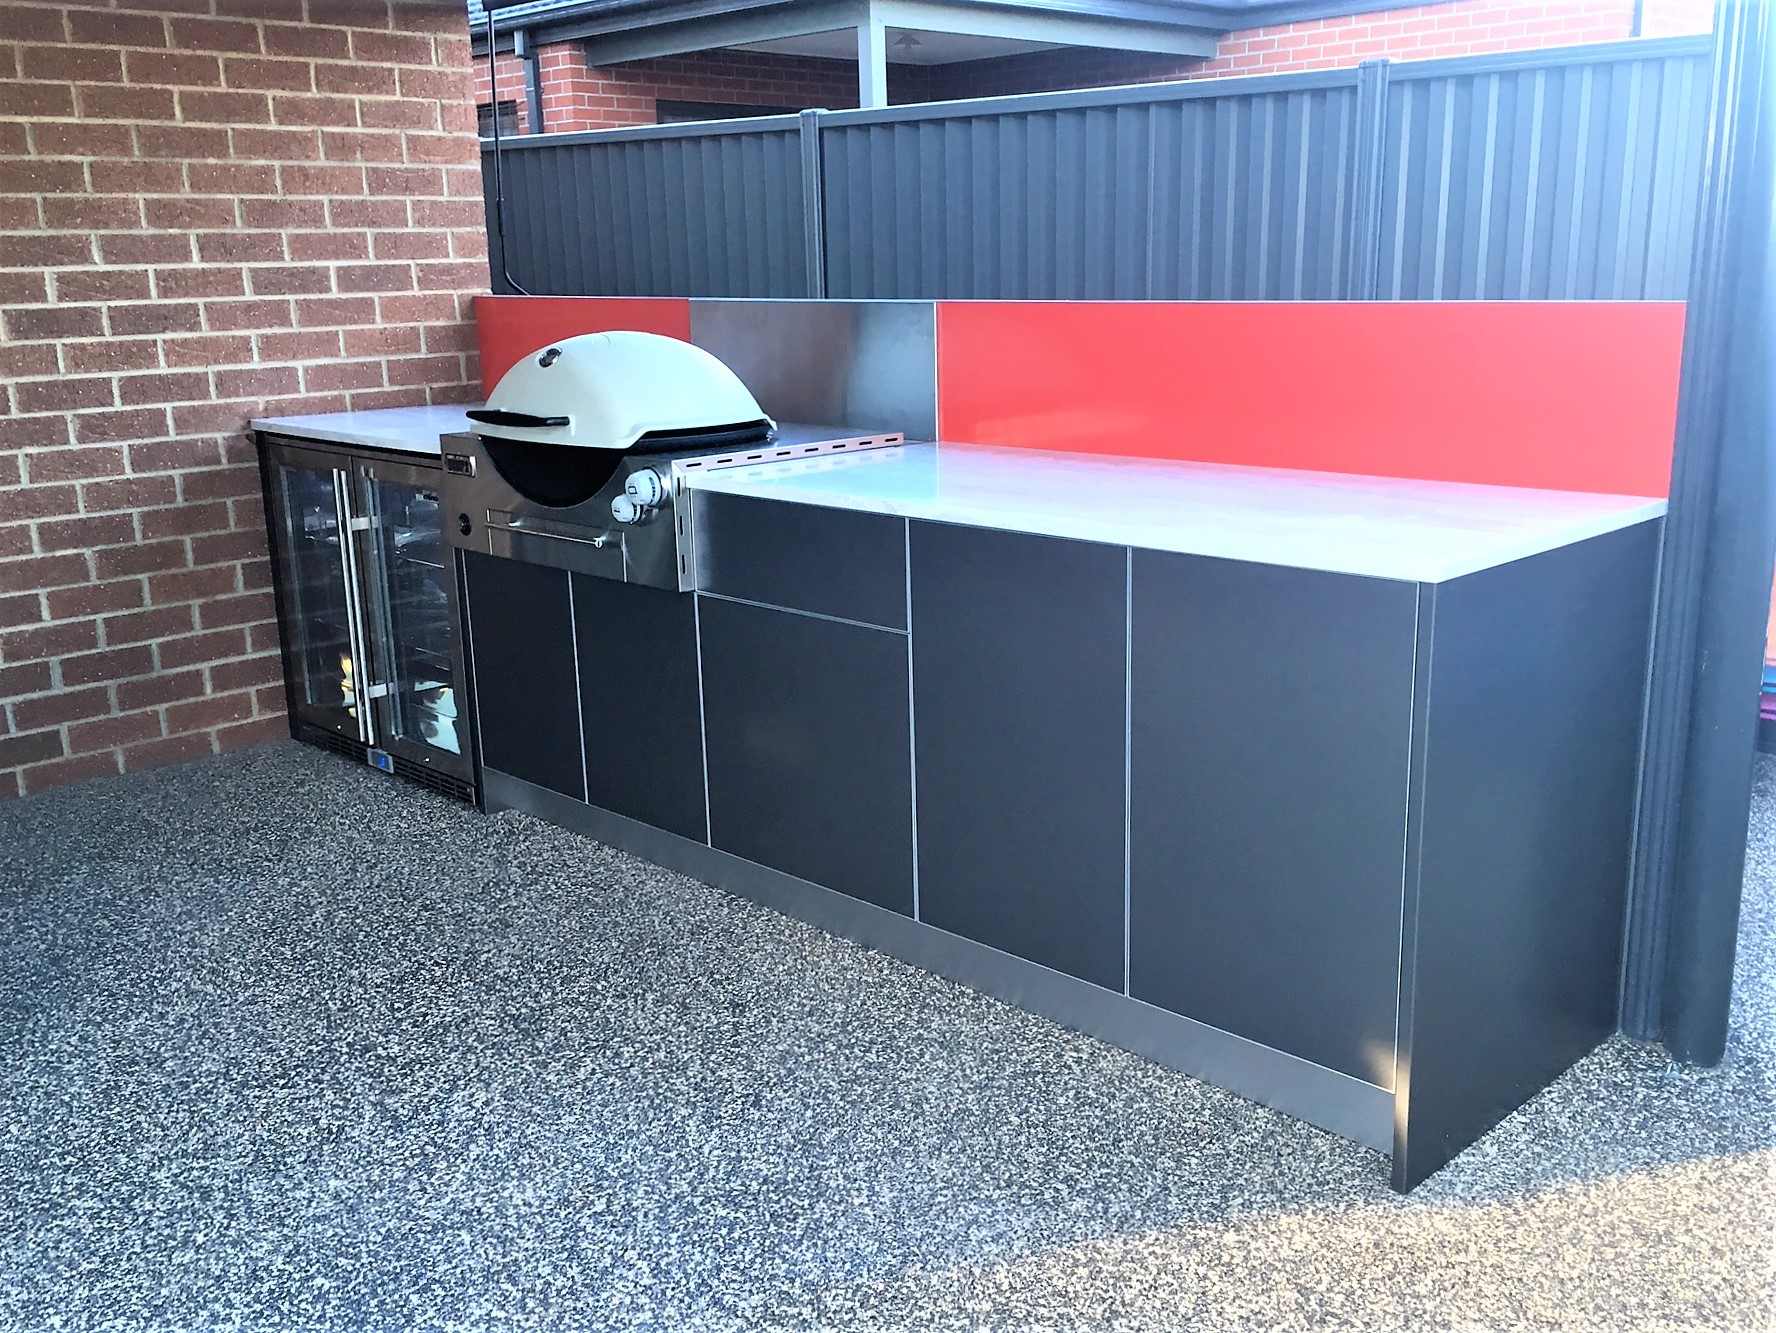 Weber Q3600 BBQ Metallic Charcoal with Corian Raincloud Alfresco kitchen Lara 430-2